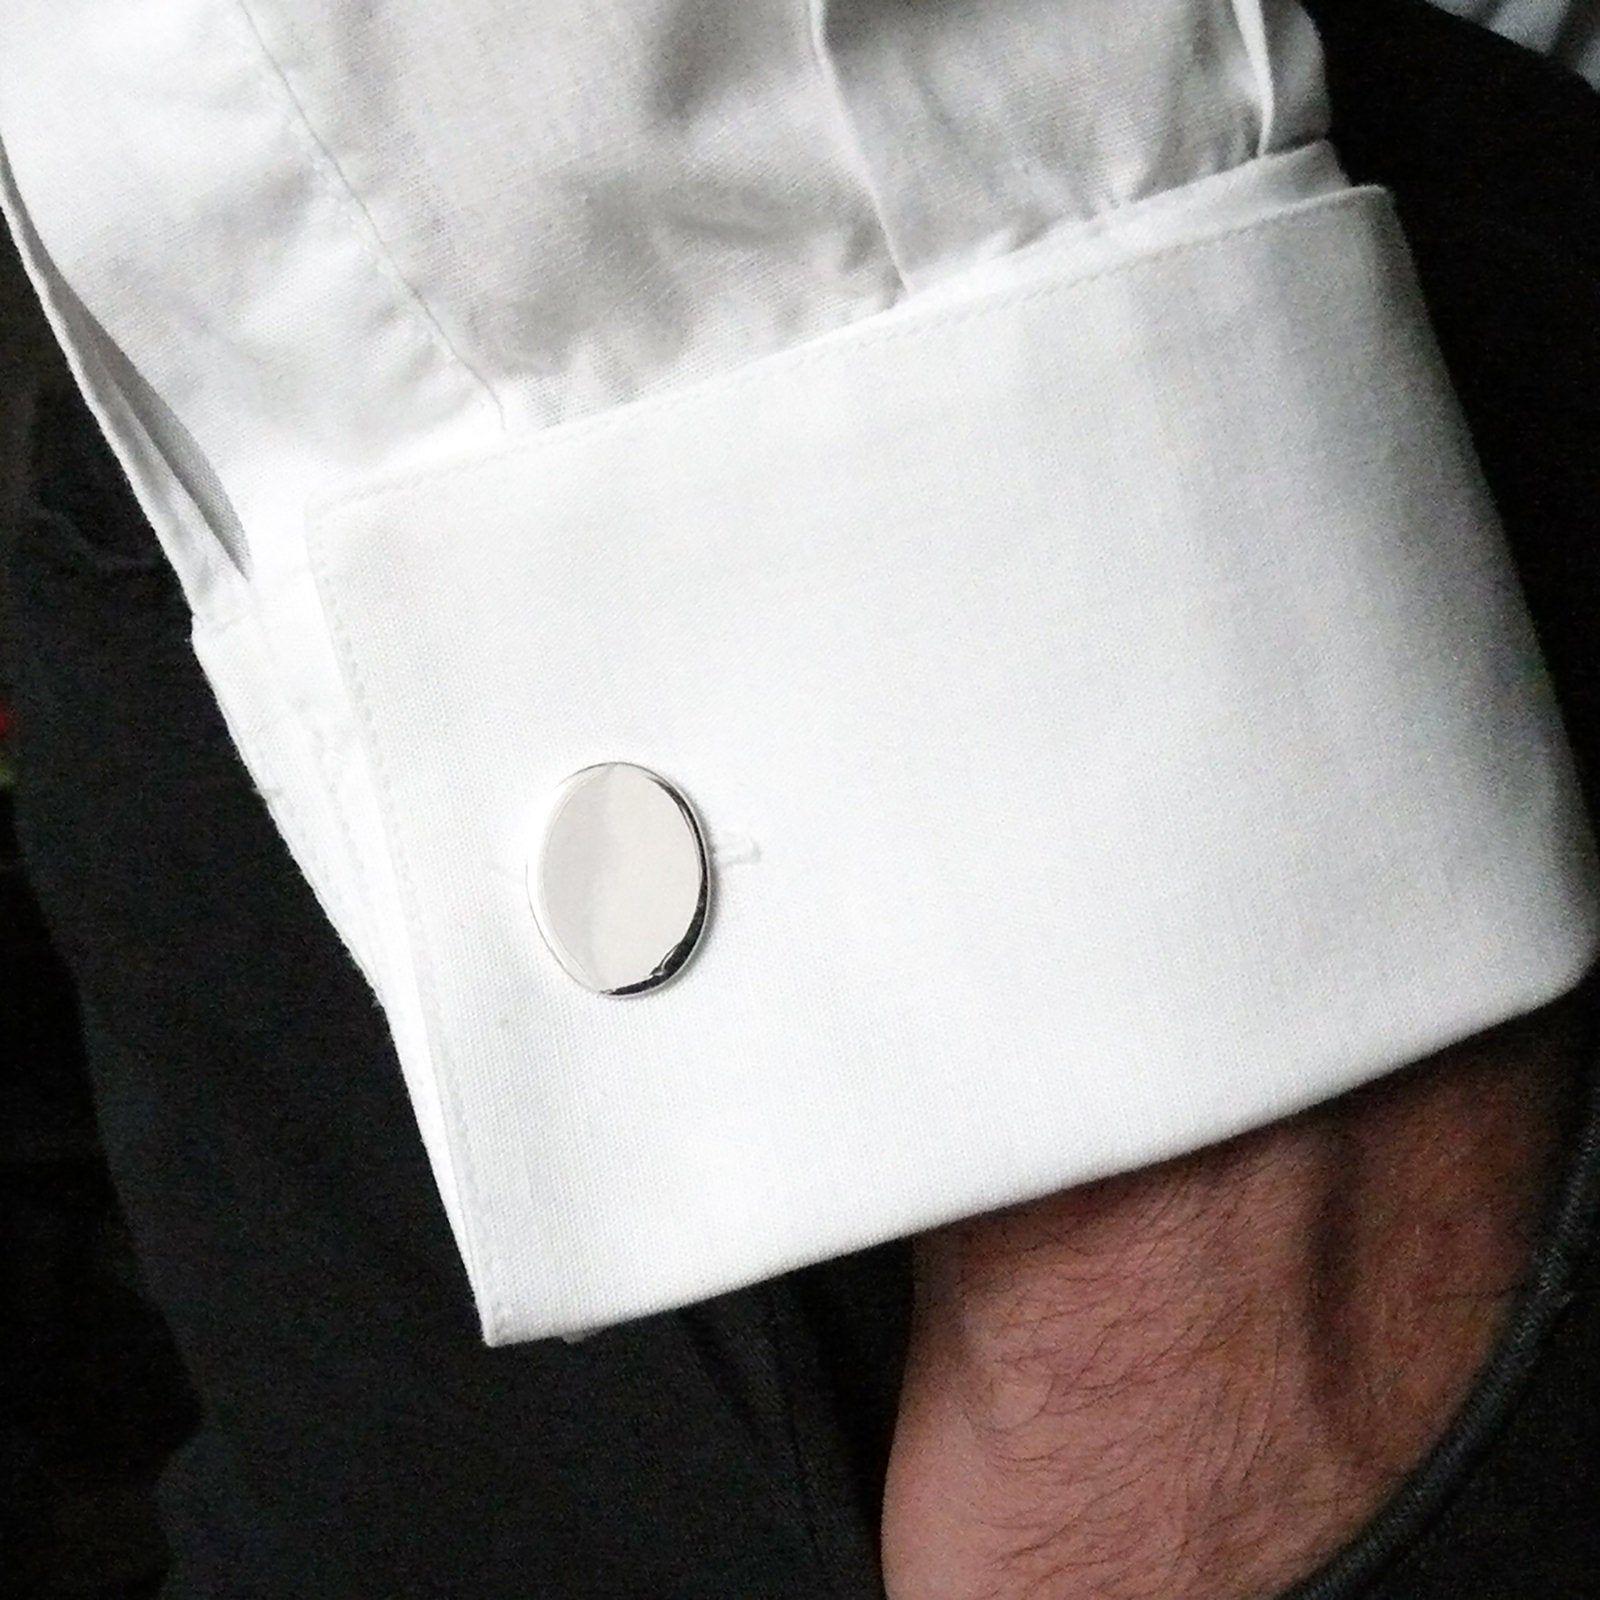 reputable site 8a82d 7a000 Polsini gemelli ovali argento 925 per camicia uomo cerimonia ...